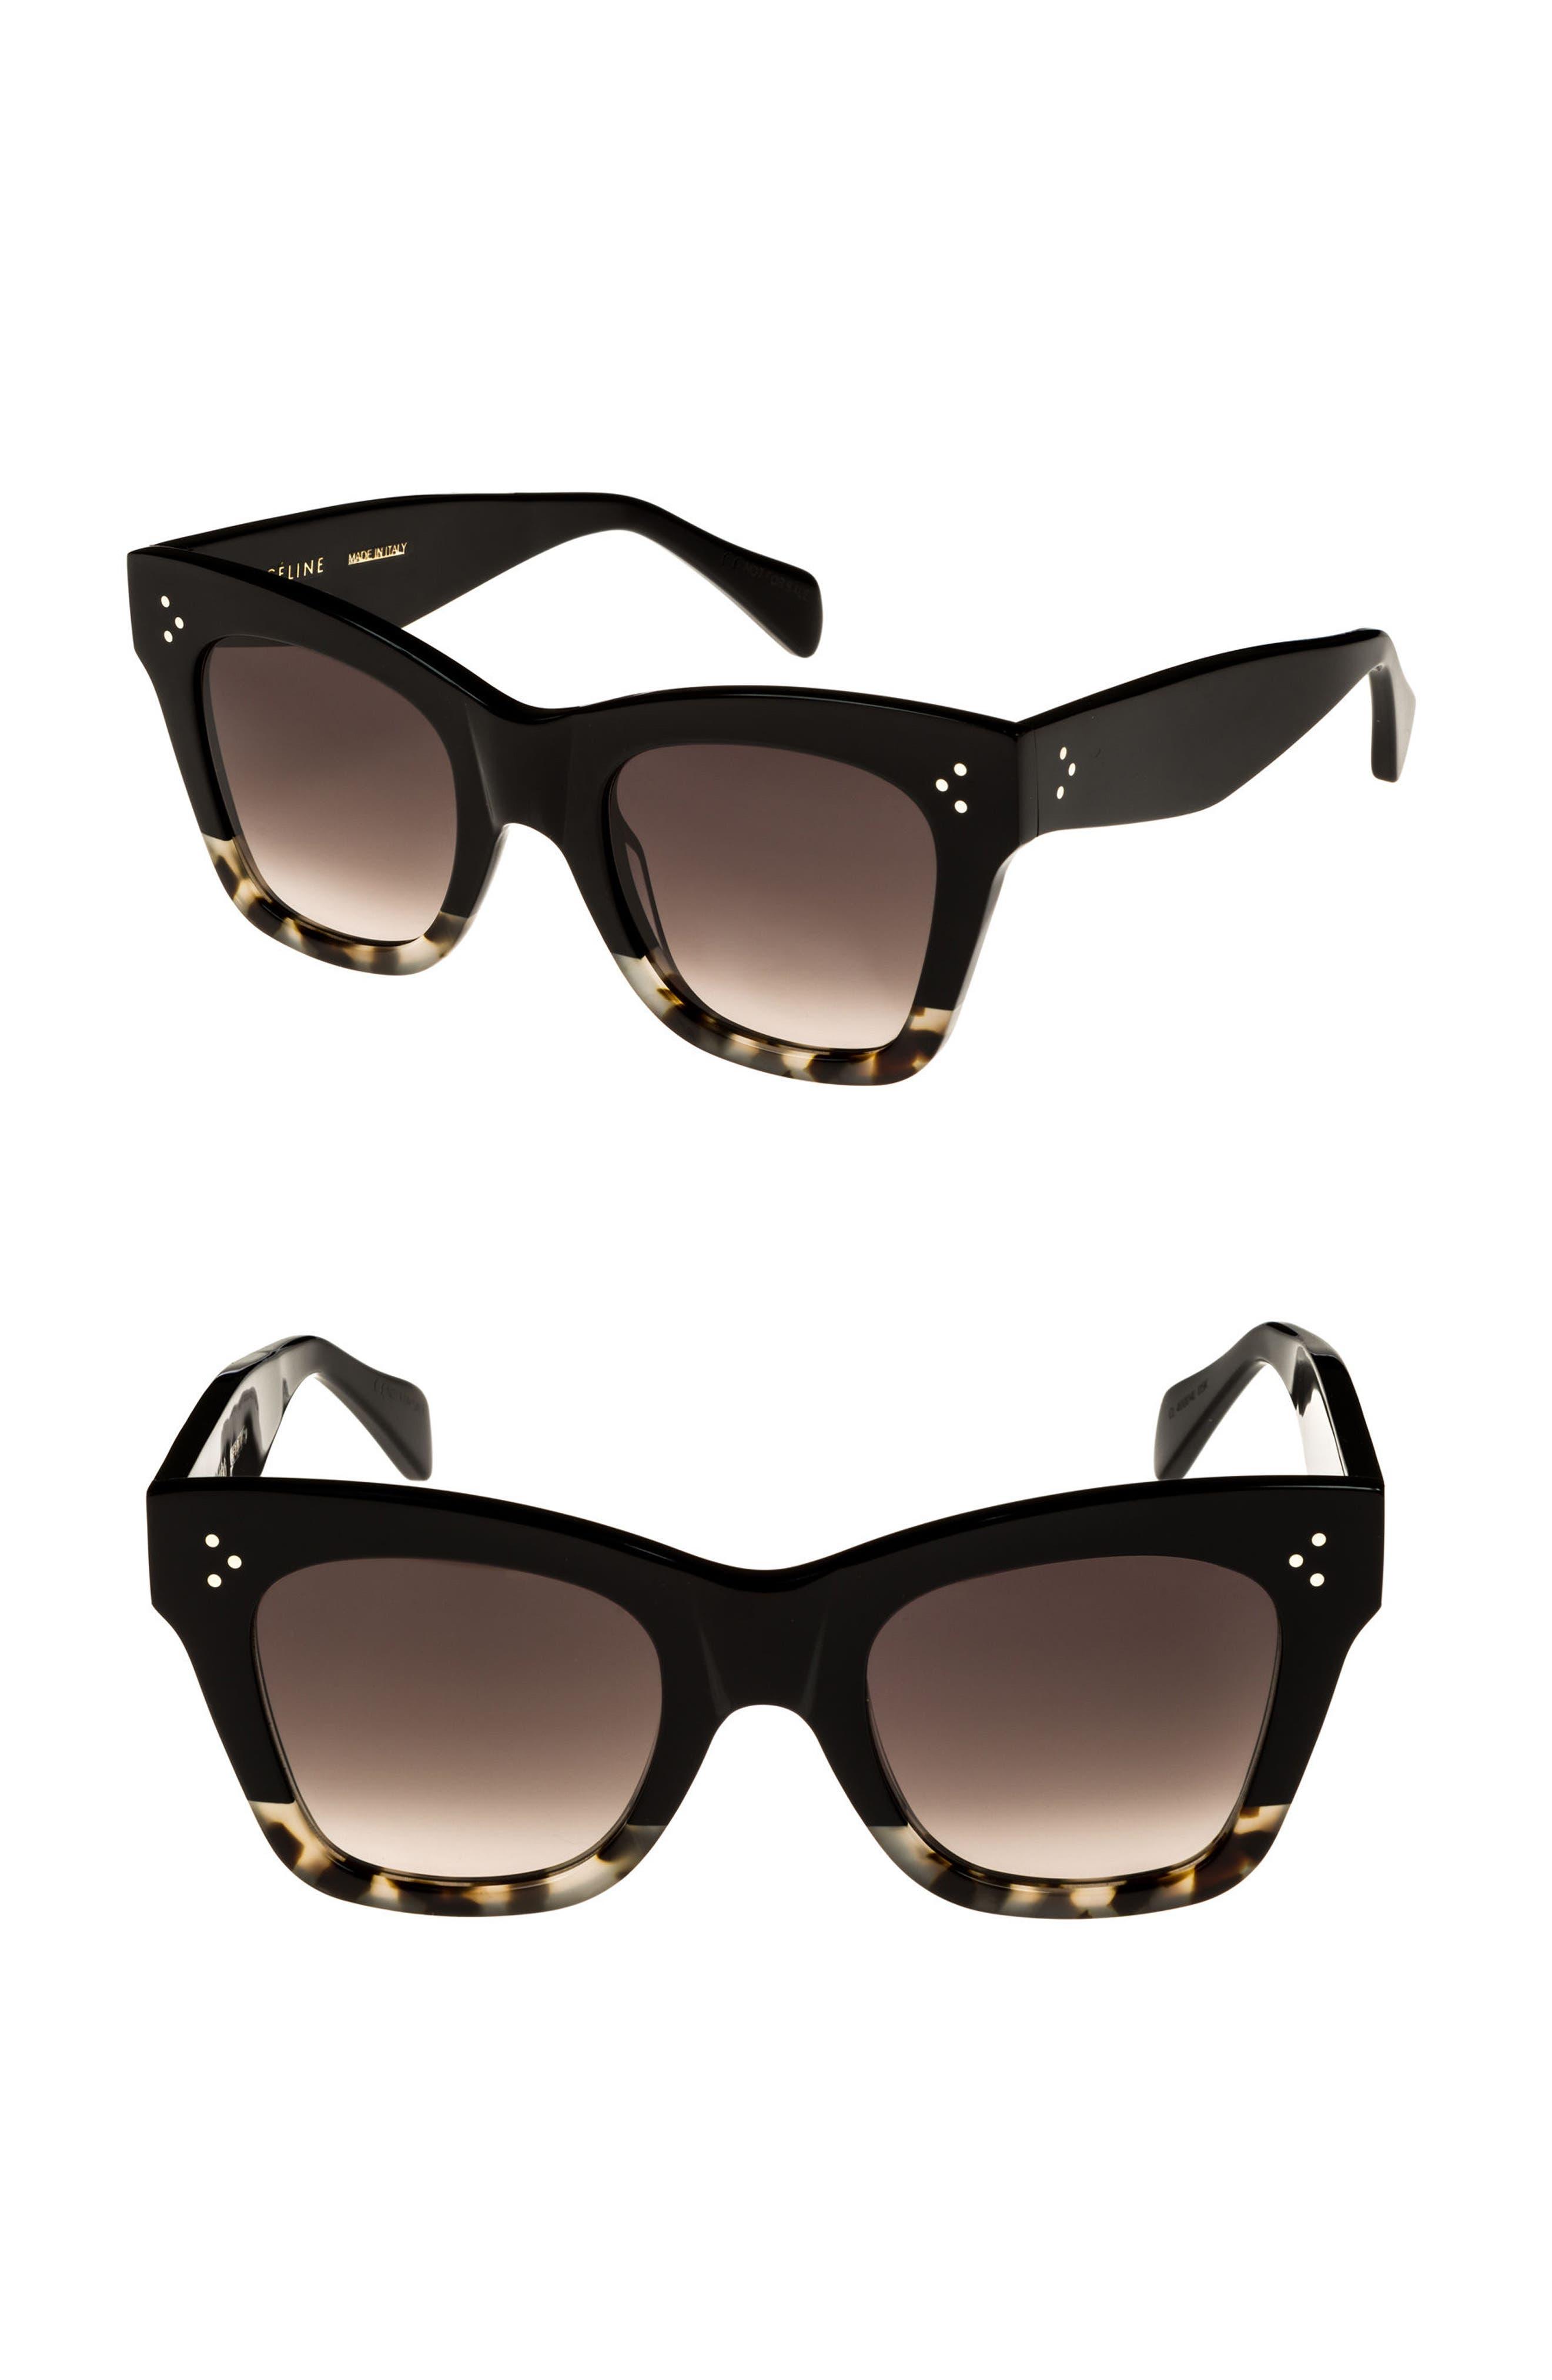 CELINE, 50mm Gradient Butterfly Sunglasses, Alternate thumbnail 2, color, BLACK/ GREY HAVANA/ BROWN